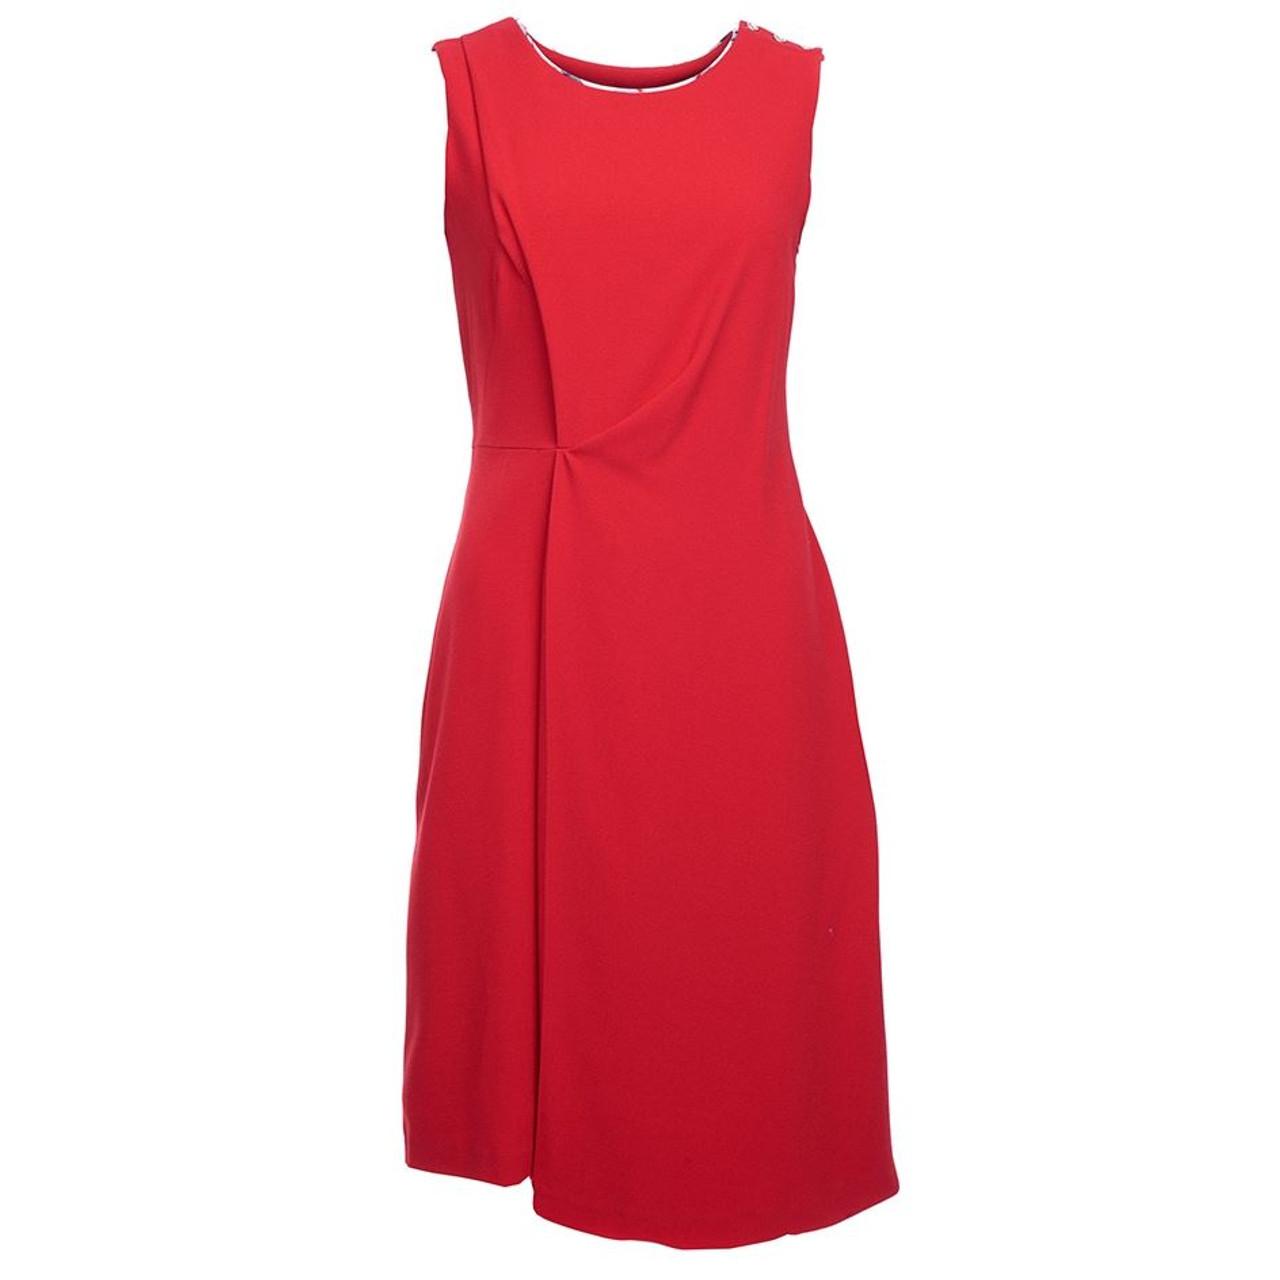 Barbour Womens Leathen Sleeveless Dress